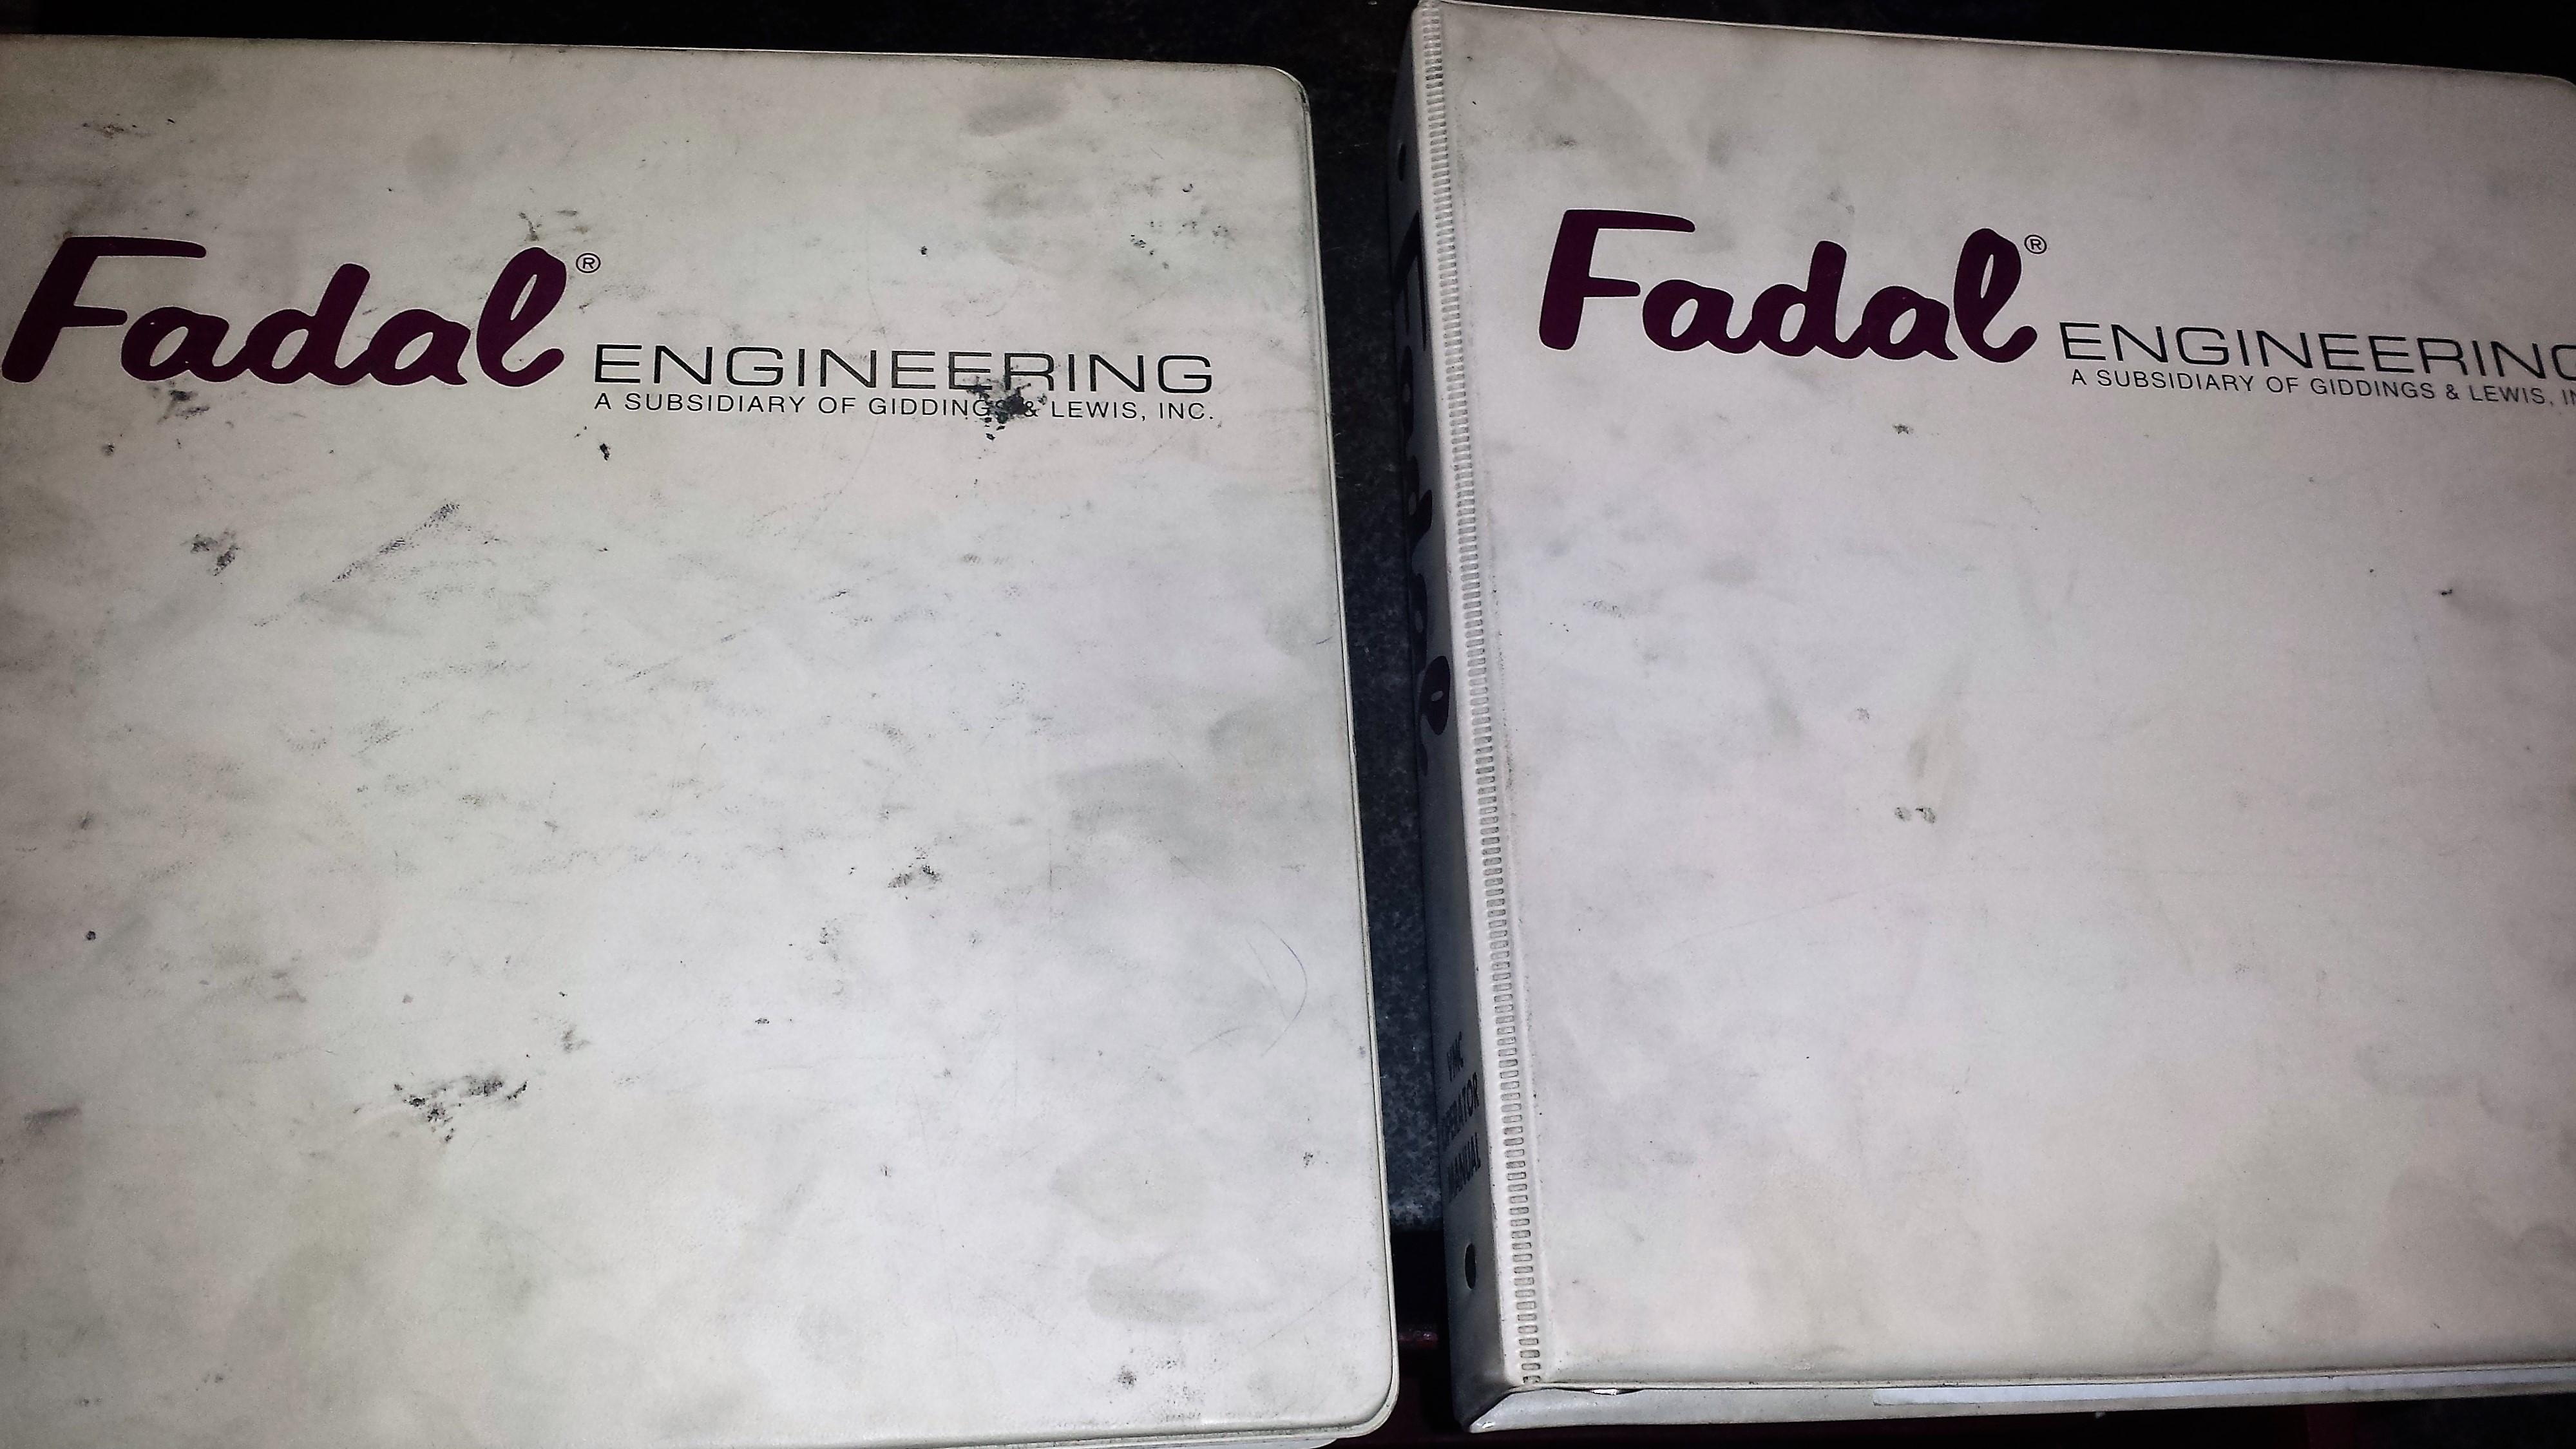 Post Processors For fadal Cnc